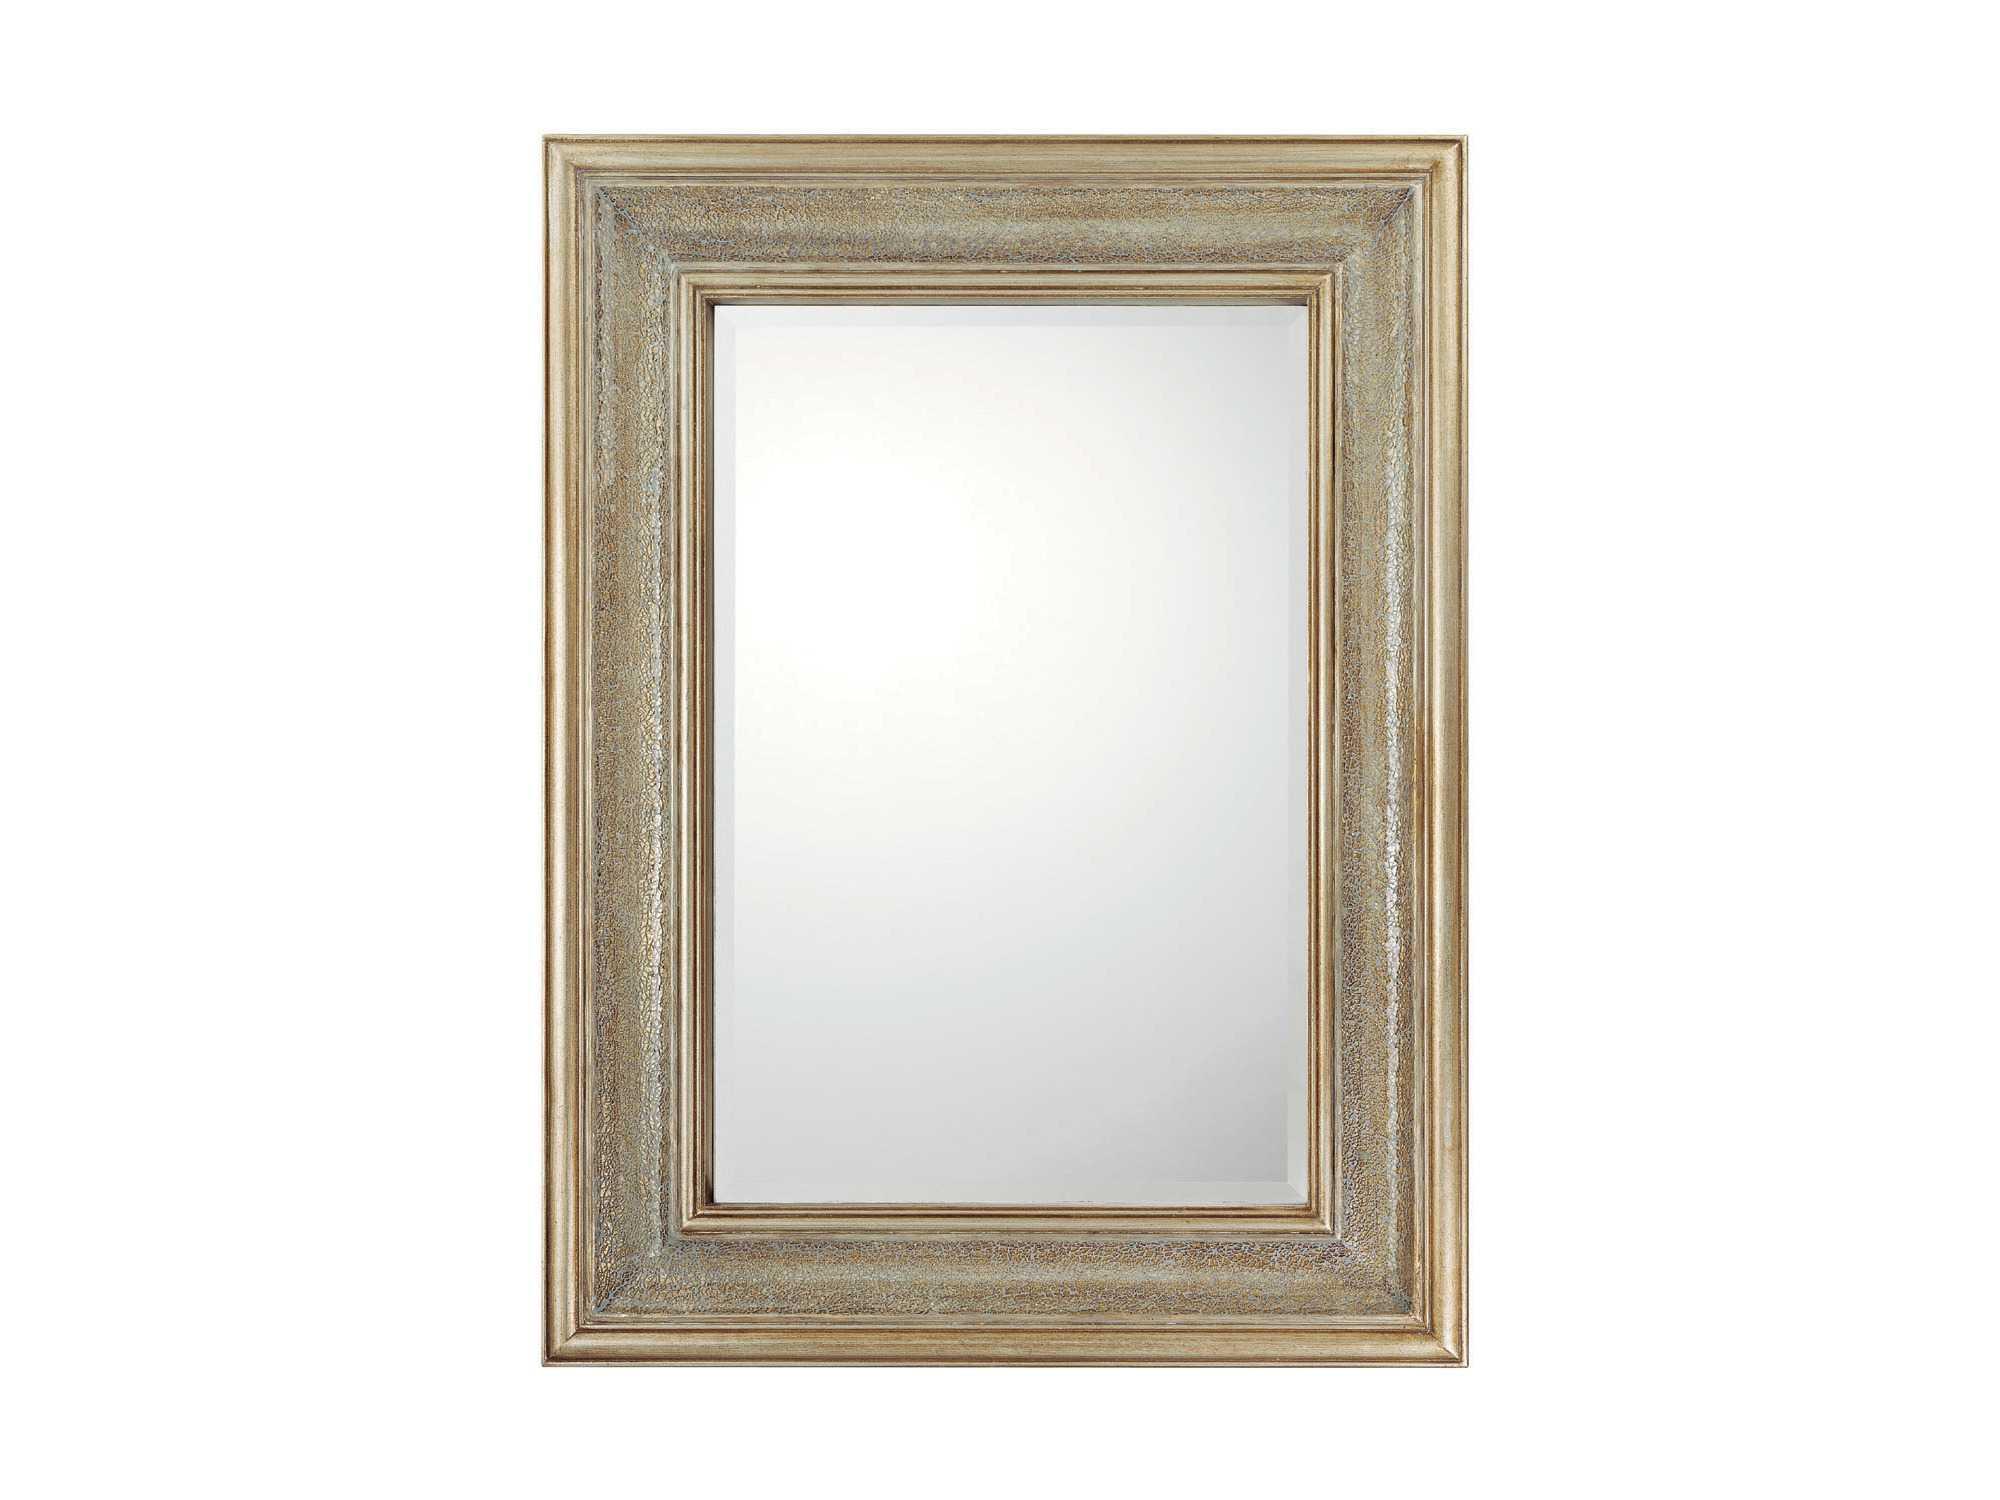 Capital lighting 36 x 48 rectangular beveled gold for Mirror 48 x 36